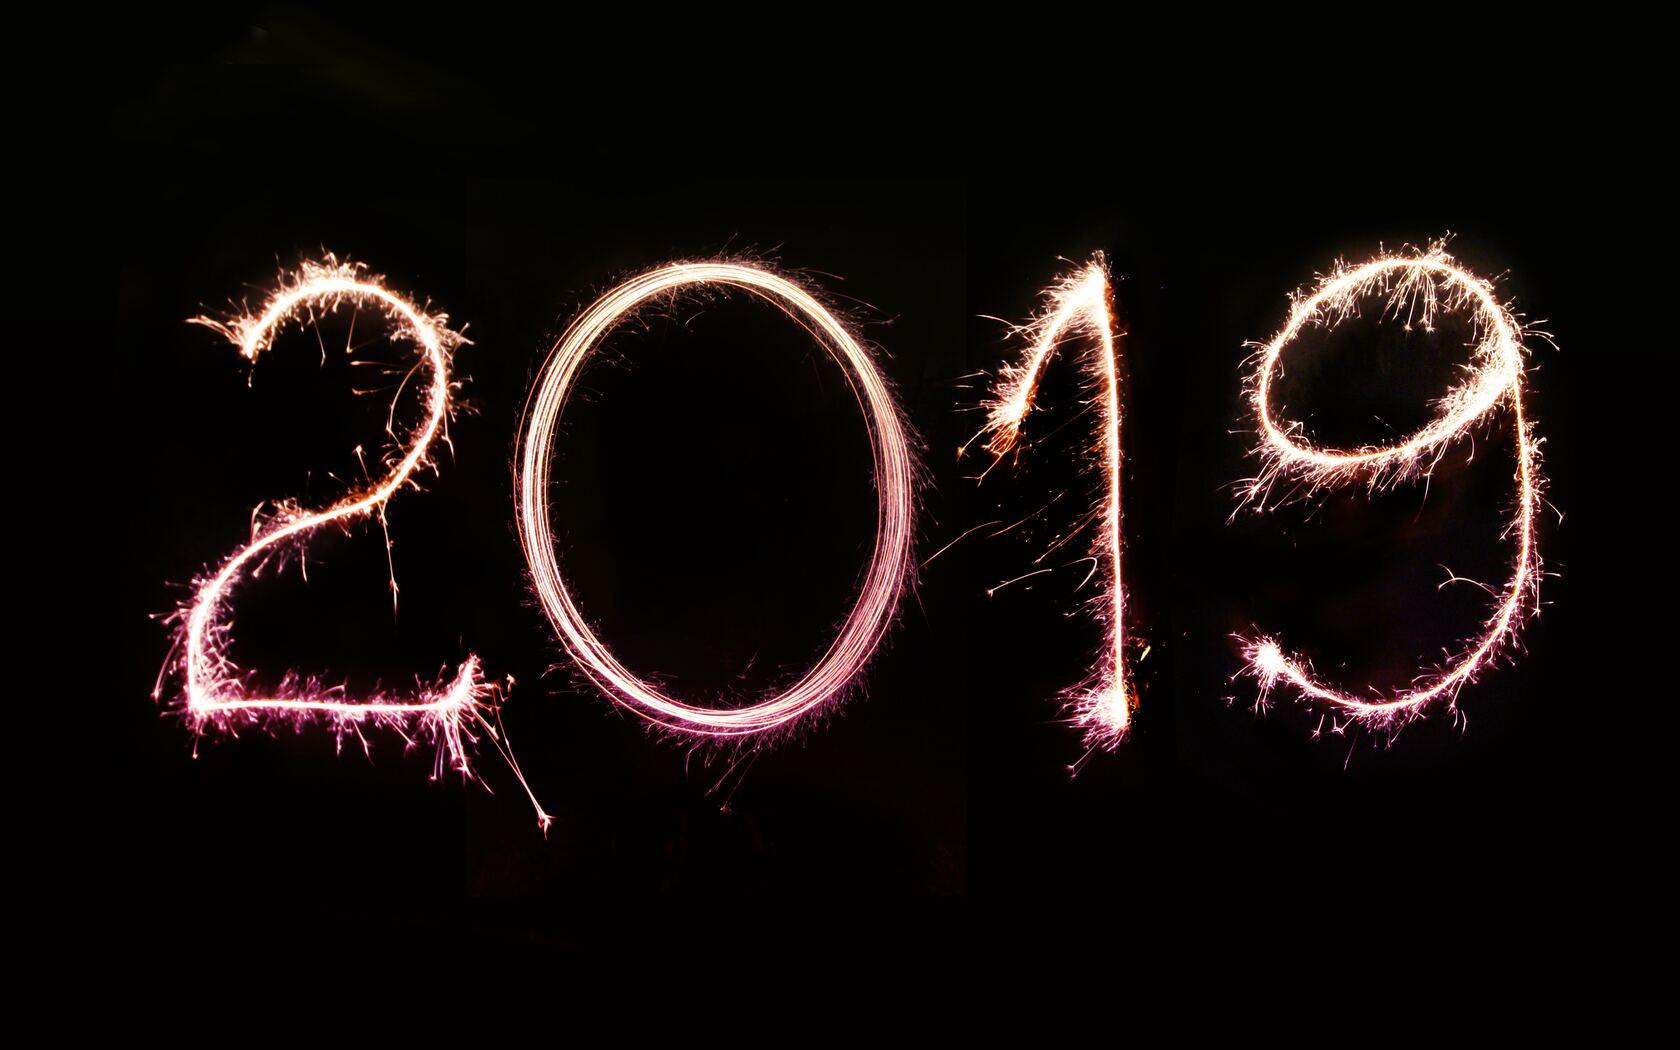 1680x1050 Happy New Year 2019 1680x1050 Resolution HD 4k